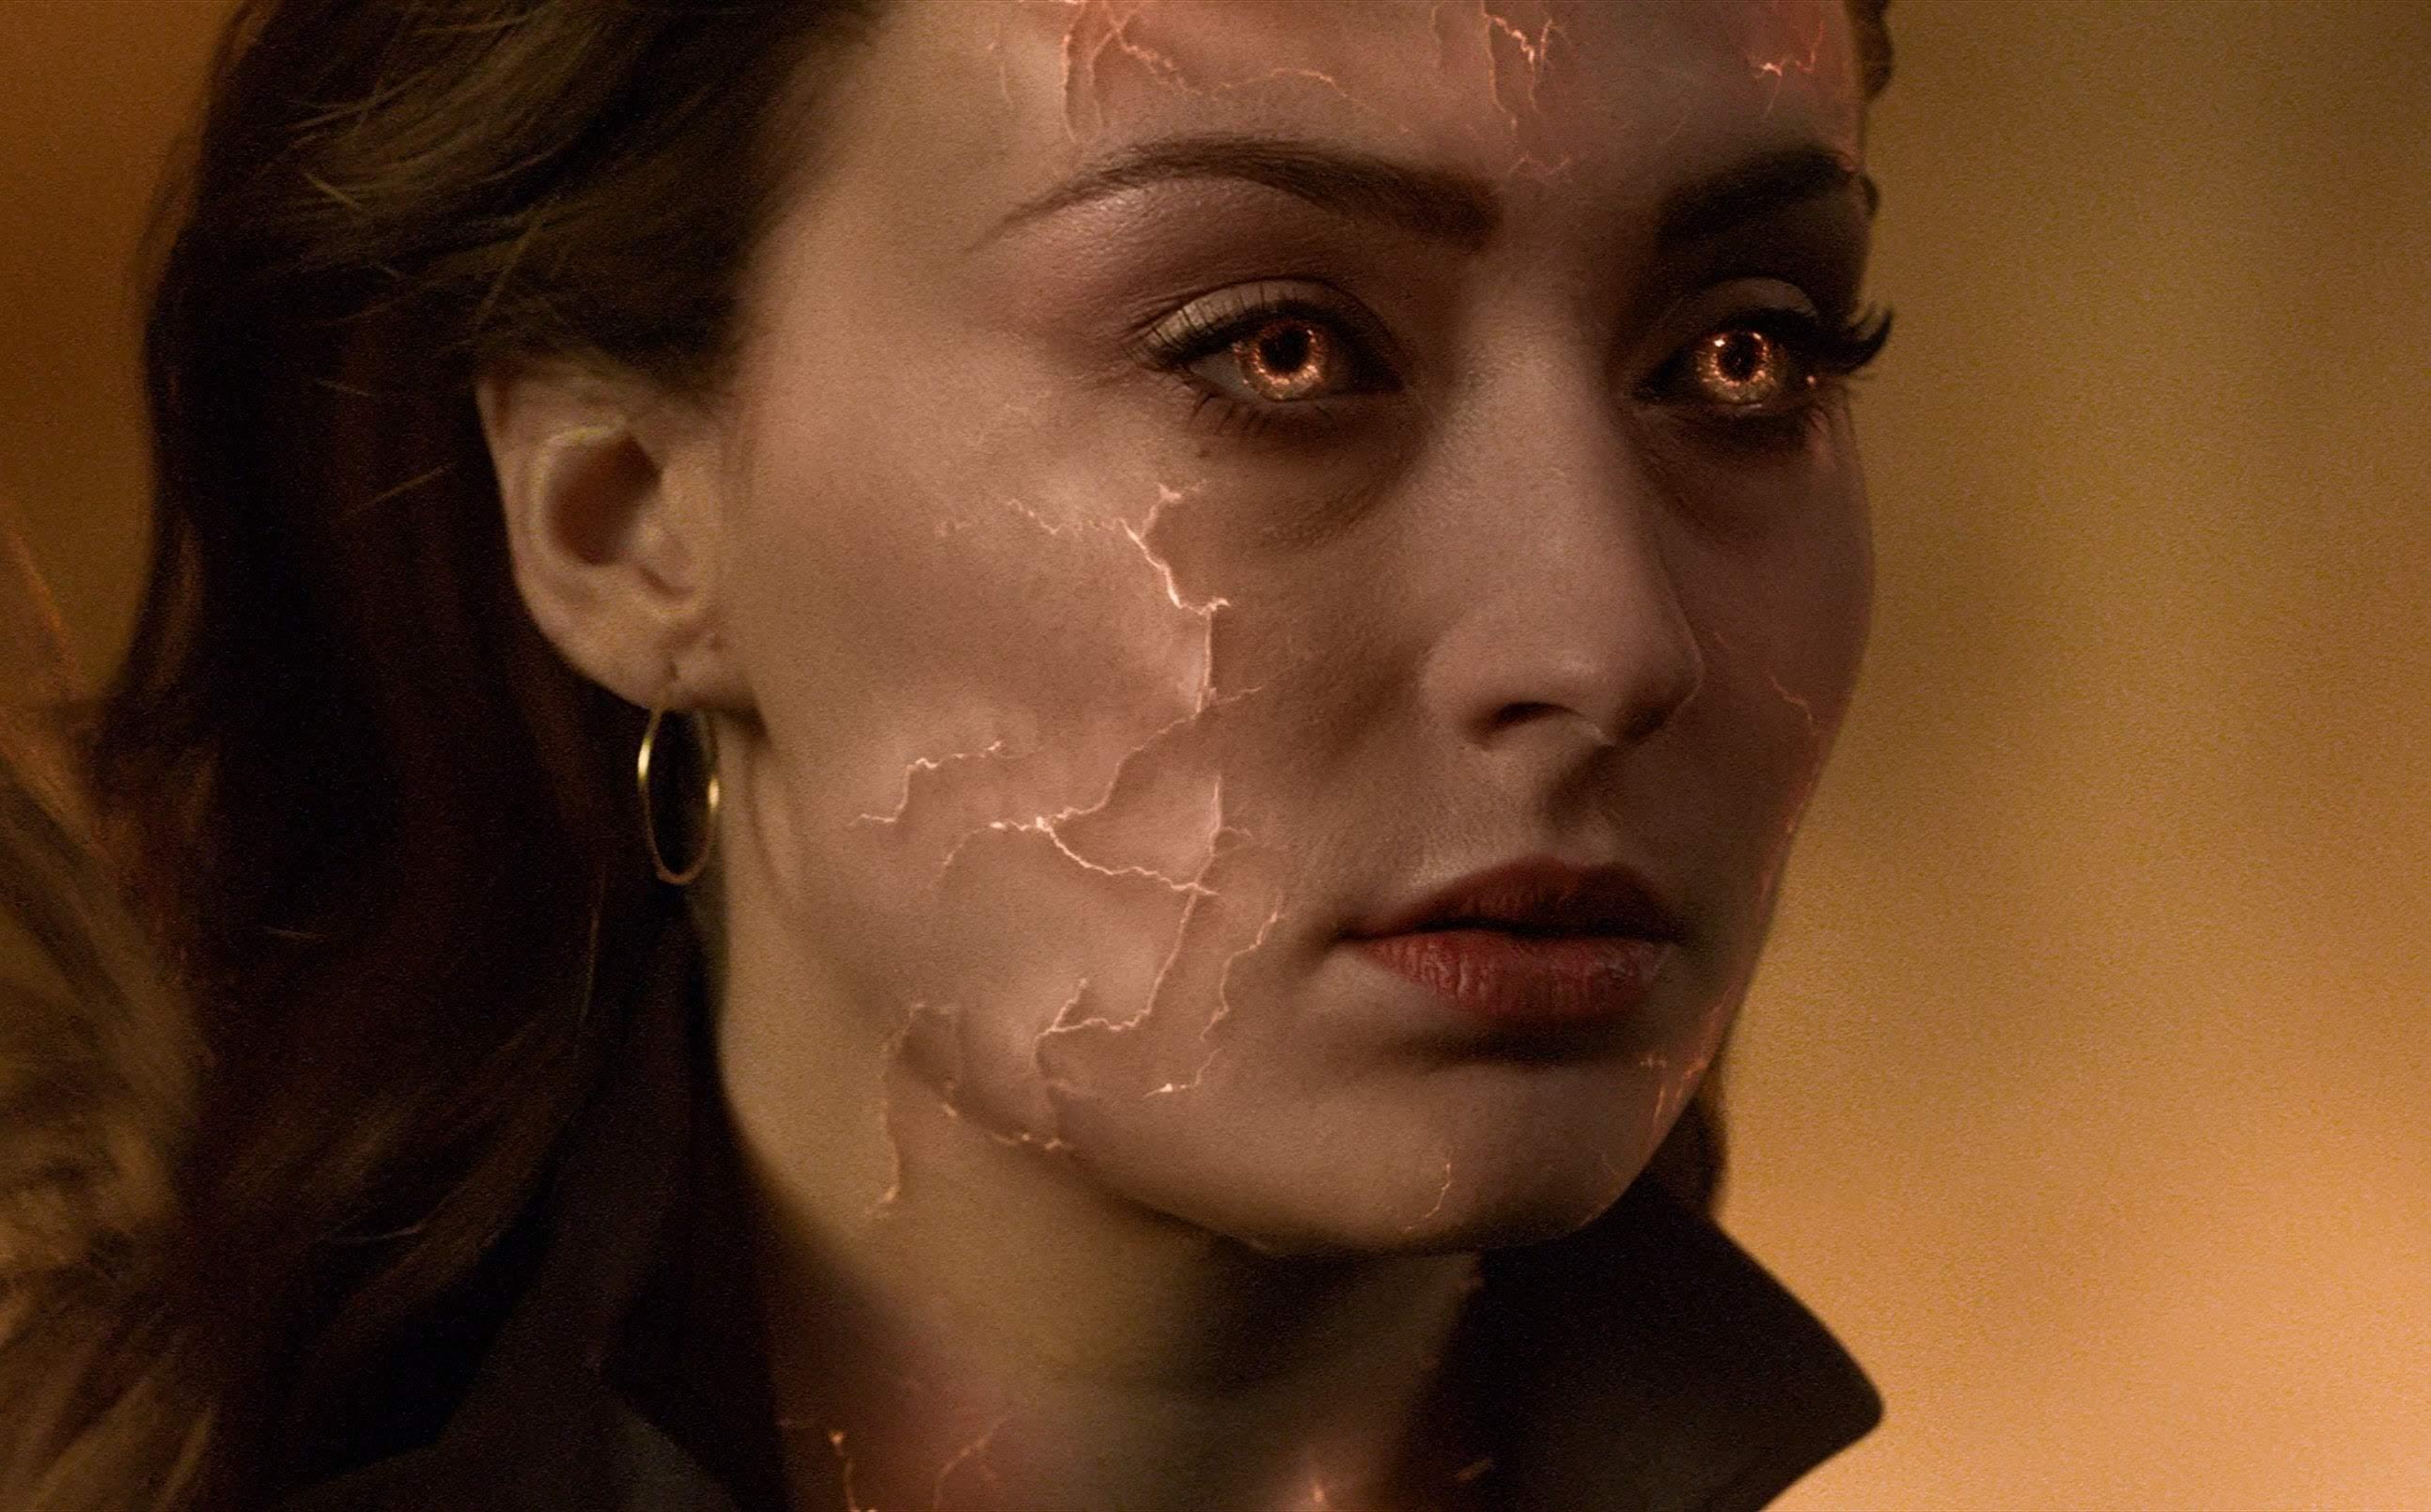 Sophie Turner and her stunt double Laura Jane Butler :「X-Men」シリーズ最終章「ダーク・フェニックス」が世界各国で封切られたソフィー・ターナーの代役をつとめているスタント・ウーマンのローラさんが、まるで双子のように見えるソックリのビックリ ! ! 😲